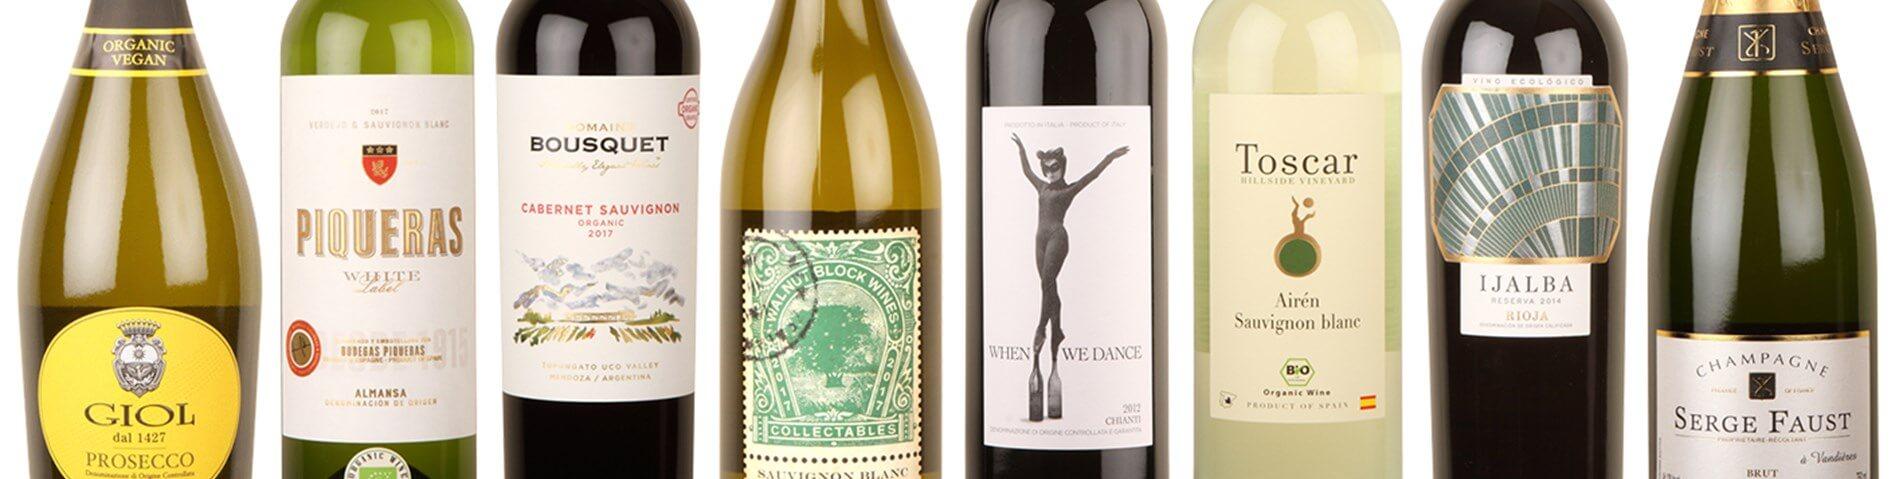 organic-wine-bottle-labels